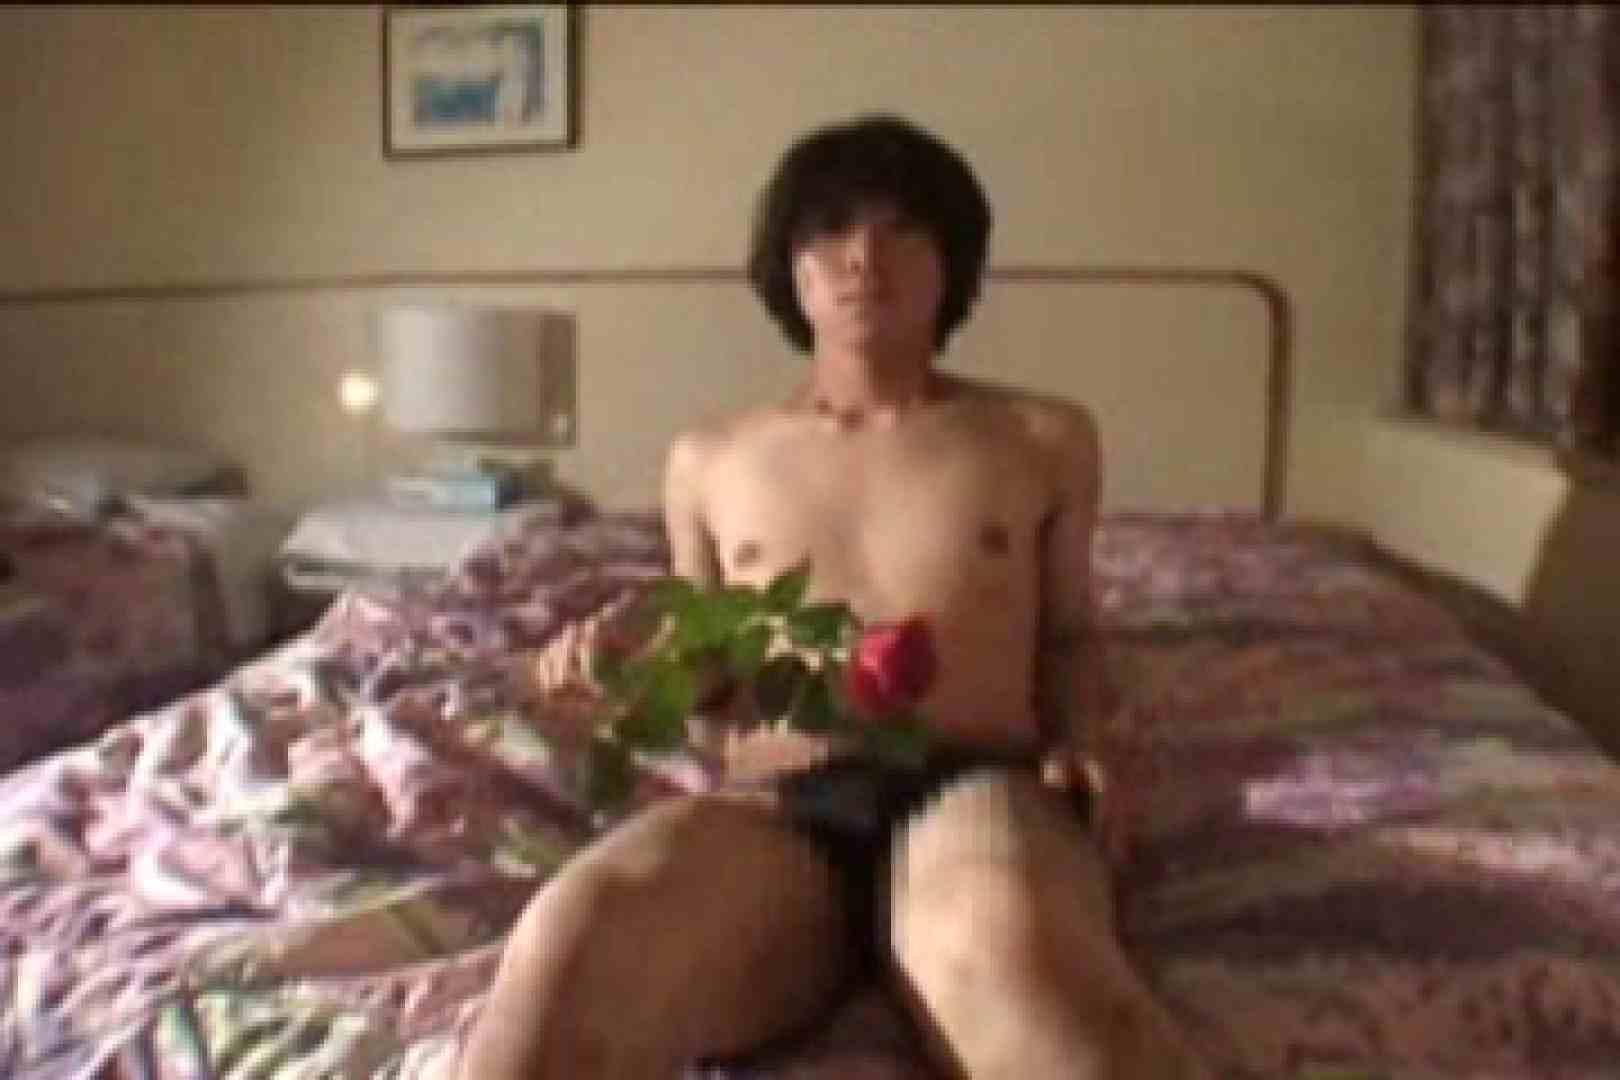 Scoop ! ! 発情した男の生堀り・ガン掘りSEX stage.1 ゲイのシックスナイン ゲイセックス画像 65pic 17